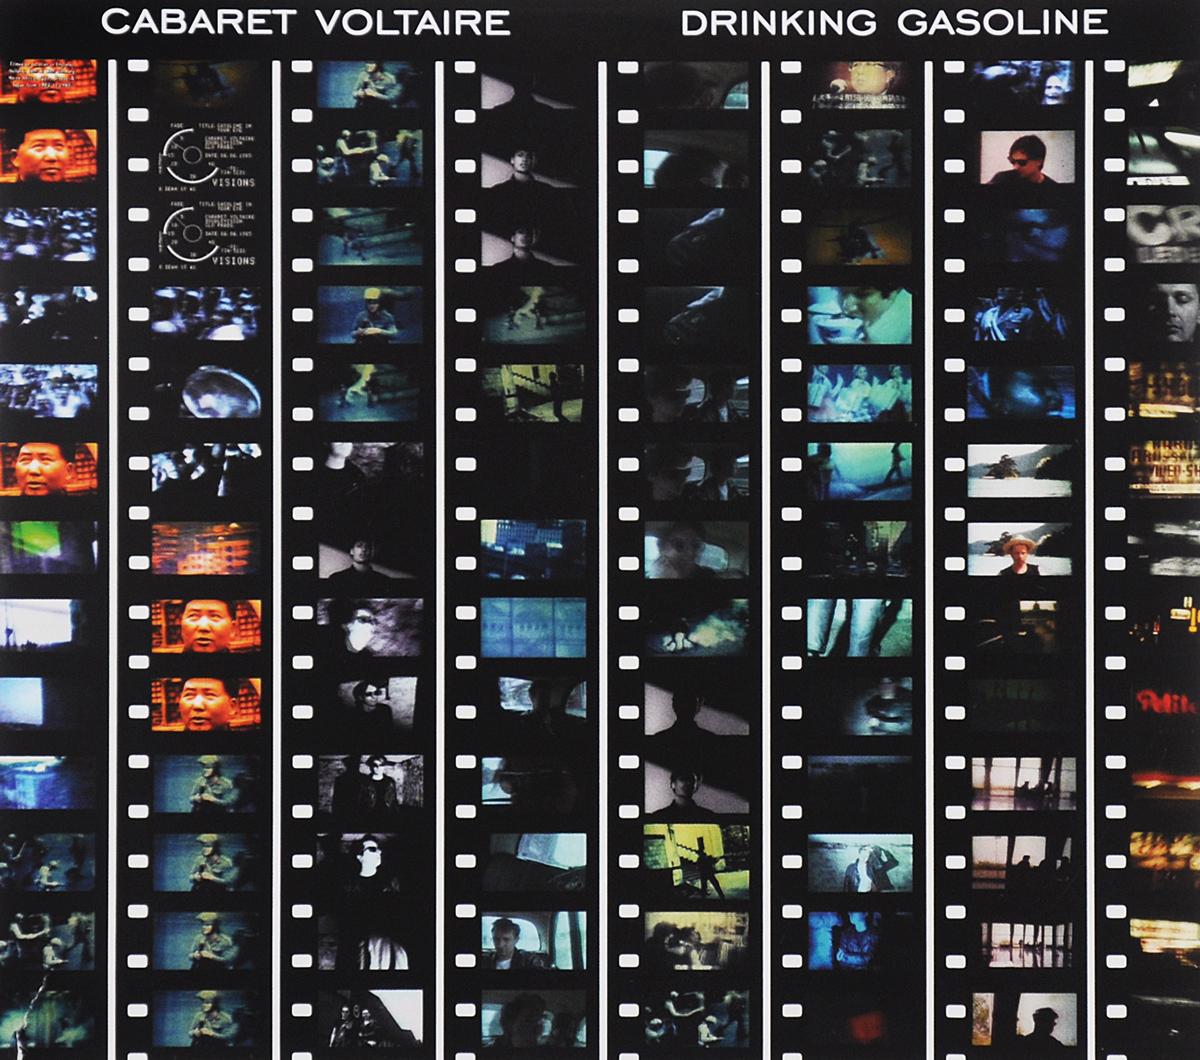 Cabaret Voltaire Cabaret Voltaire. Drinking Gasoline (CD + DVD) shanboer mix color номер xxl